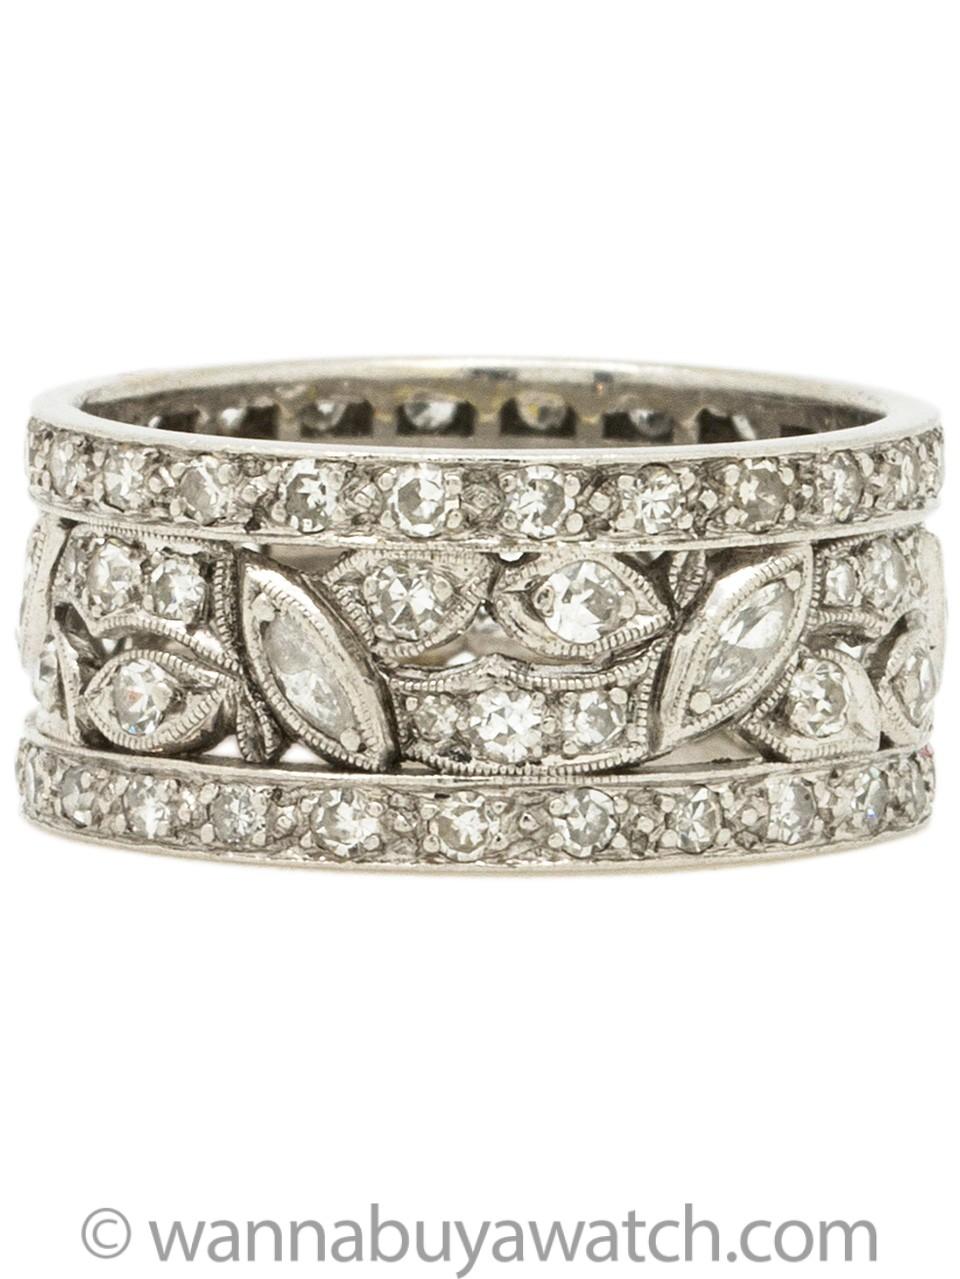 wanna buy a watch wide platinum diamond wedding band platinum diamond wedding band. Black Bedroom Furniture Sets. Home Design Ideas